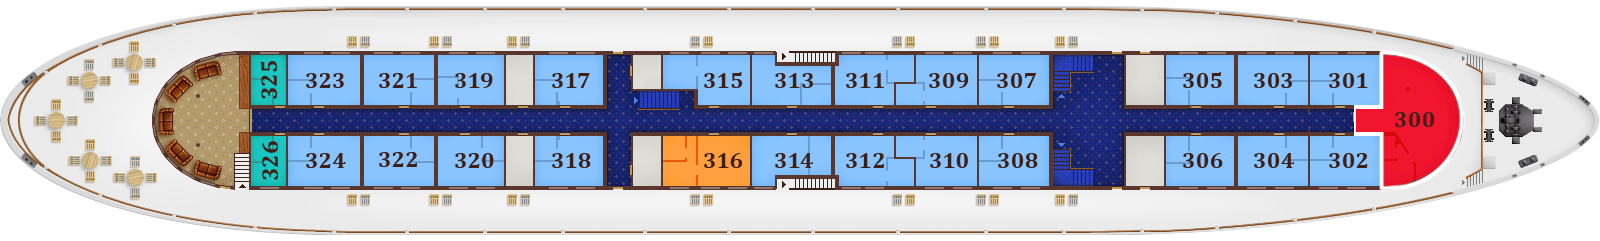 Deck Plan. Promenade Deck